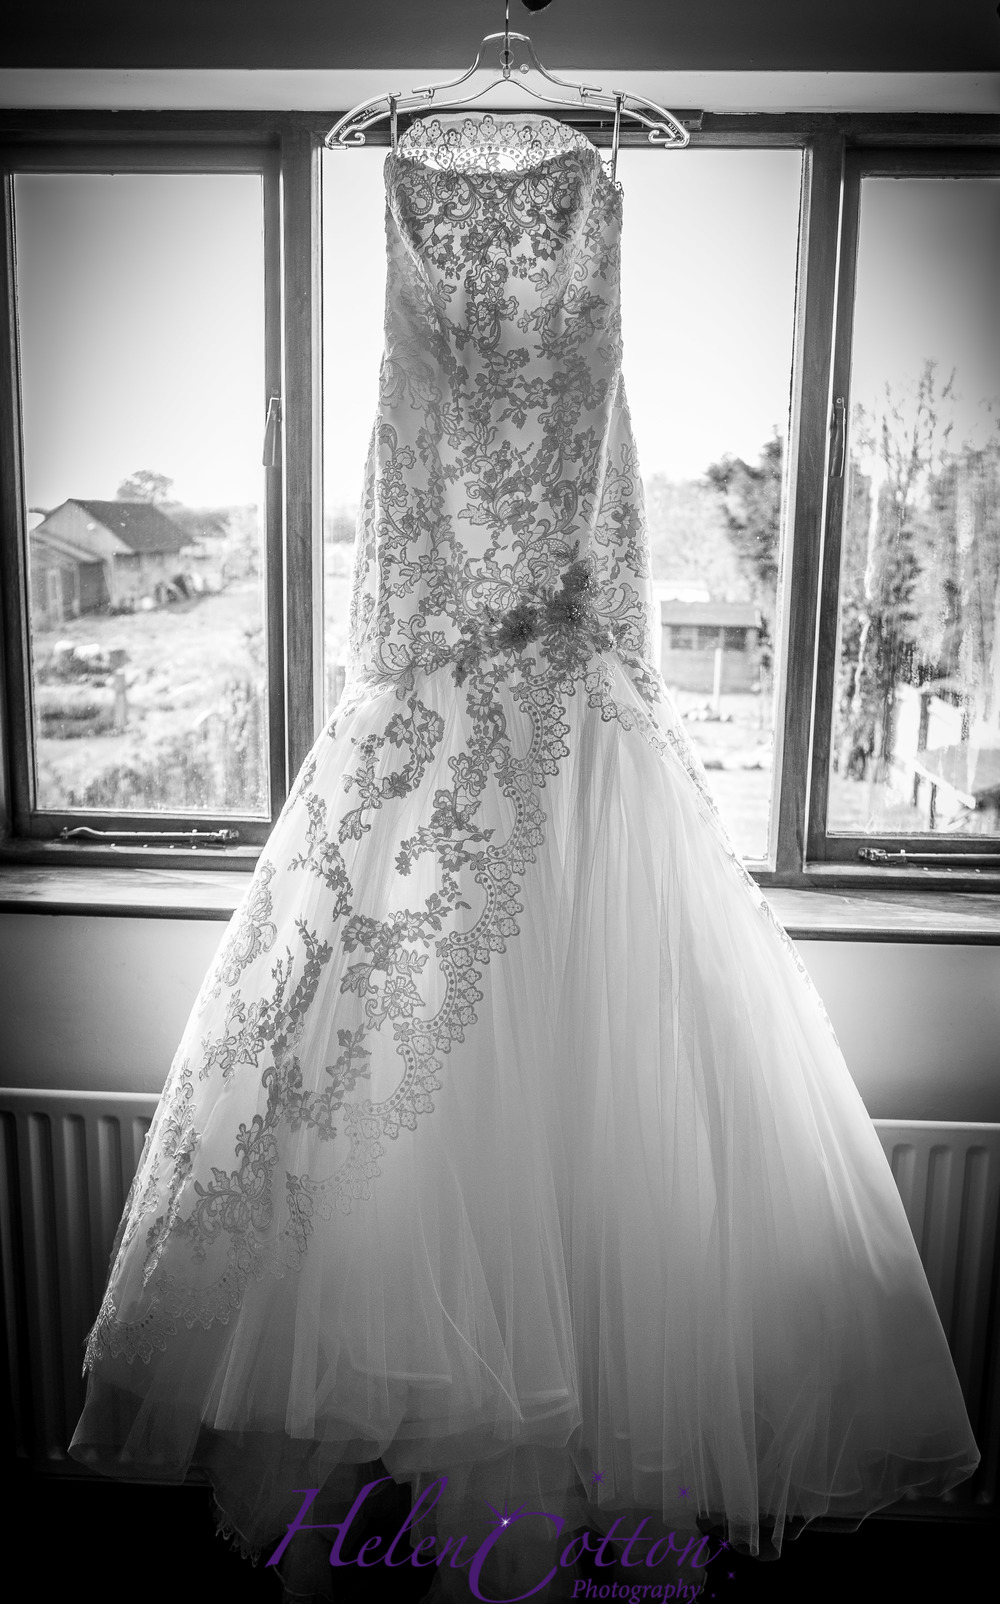 Sian & Rob's Wedding_Helen Cotton Photography©-0465.JPG